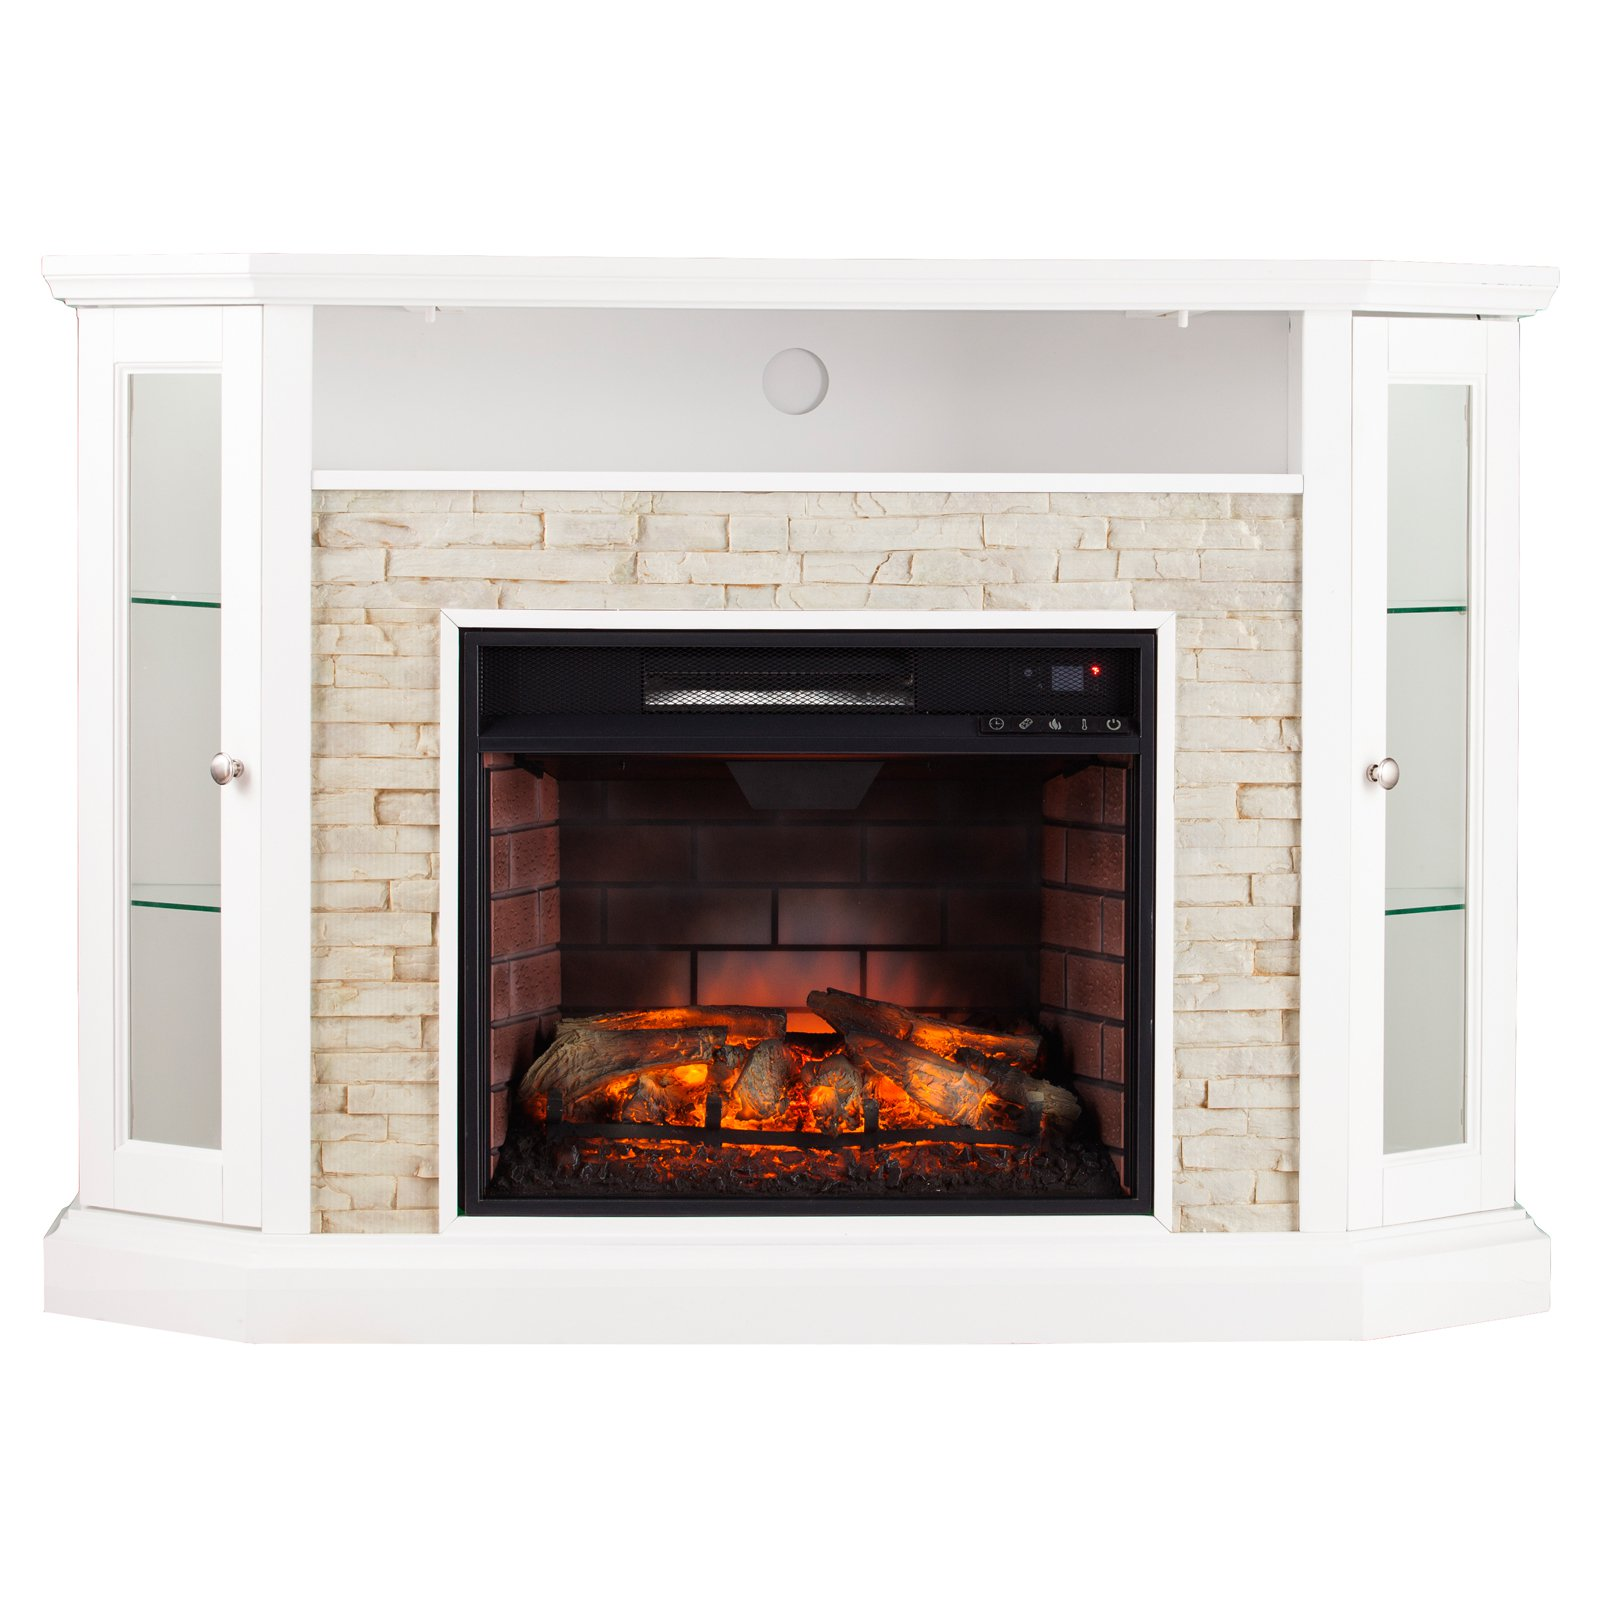 Southern Enterprises Redden Infrared Electric Media Fireplace